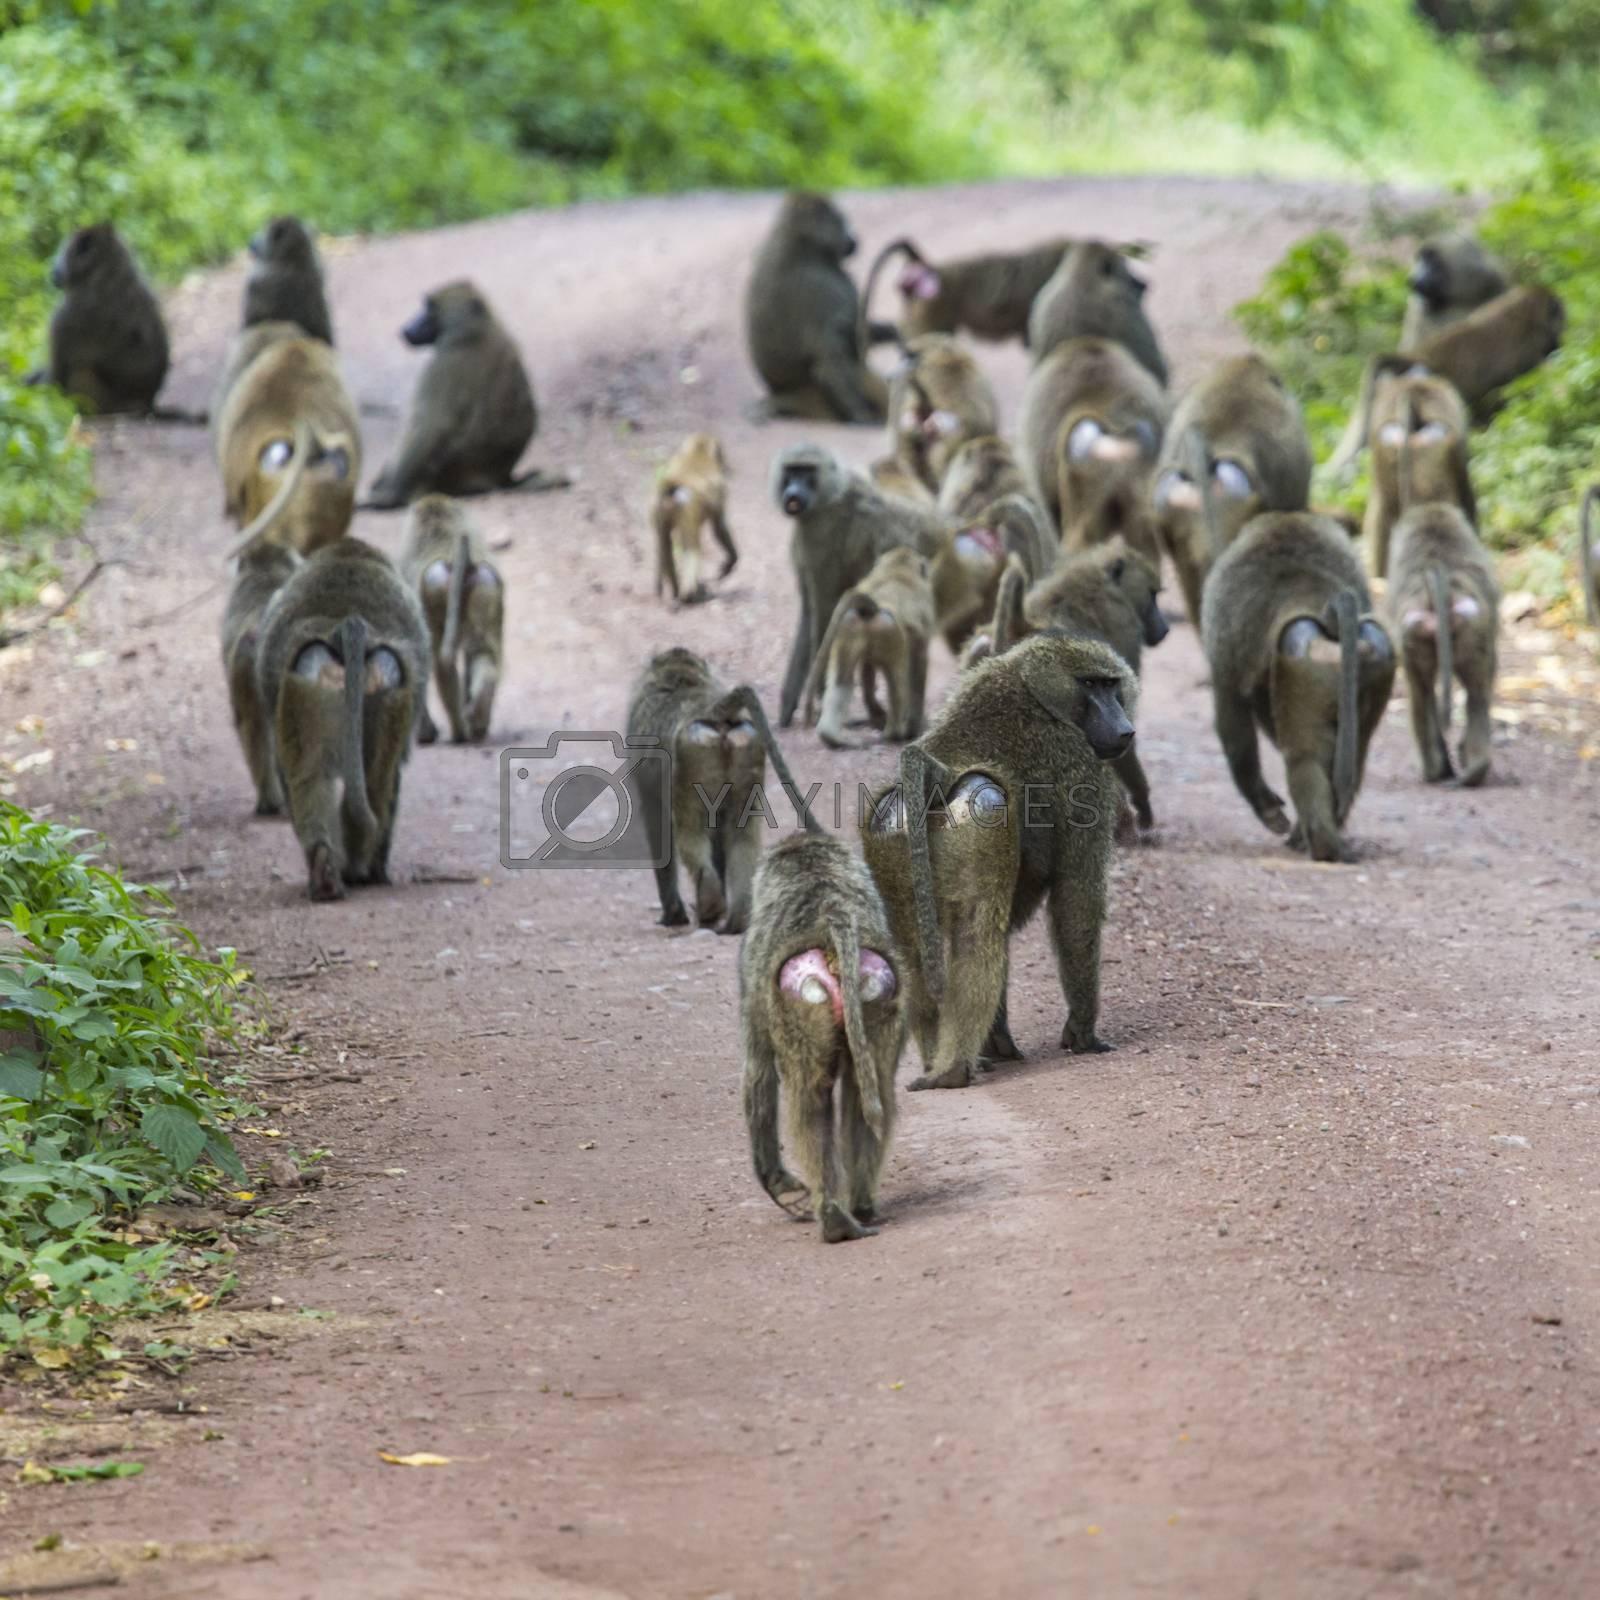 Group of Baboon monkeys in African bush. Lake Manyara National Park in Tanzania